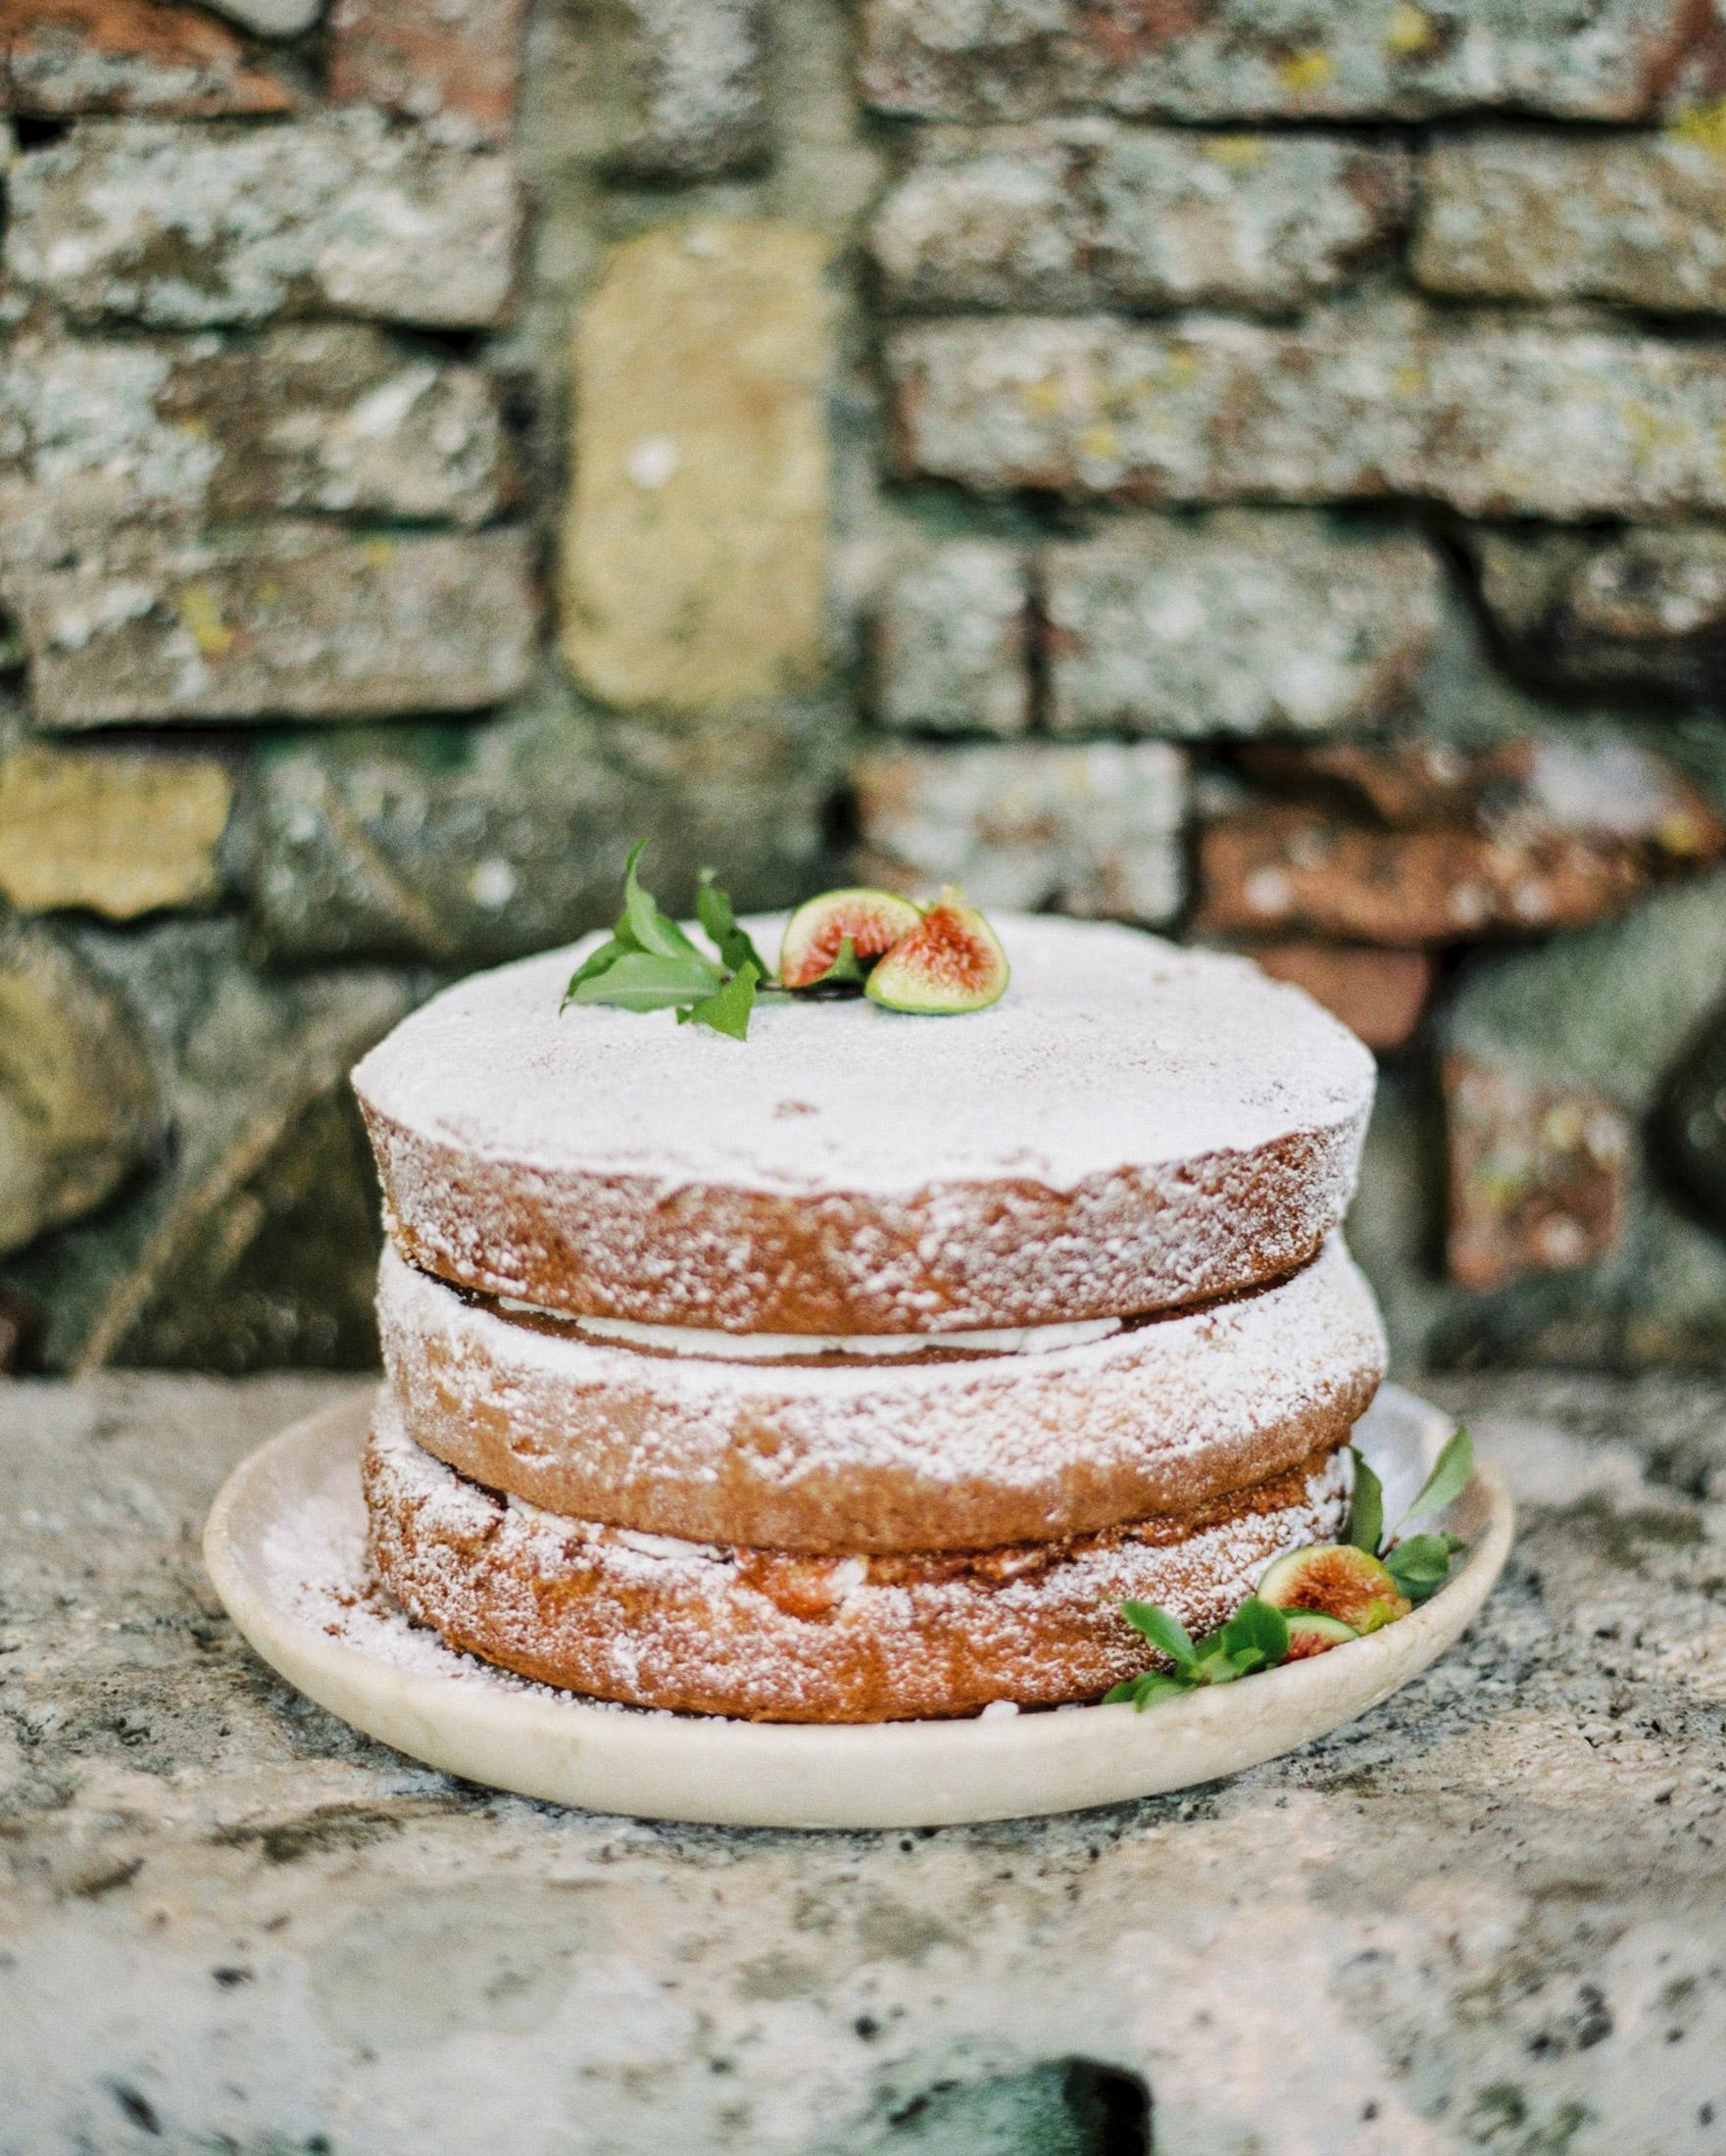 christine-dagan-wedding-naked-cake-4275_02-s113011-0616.jpg